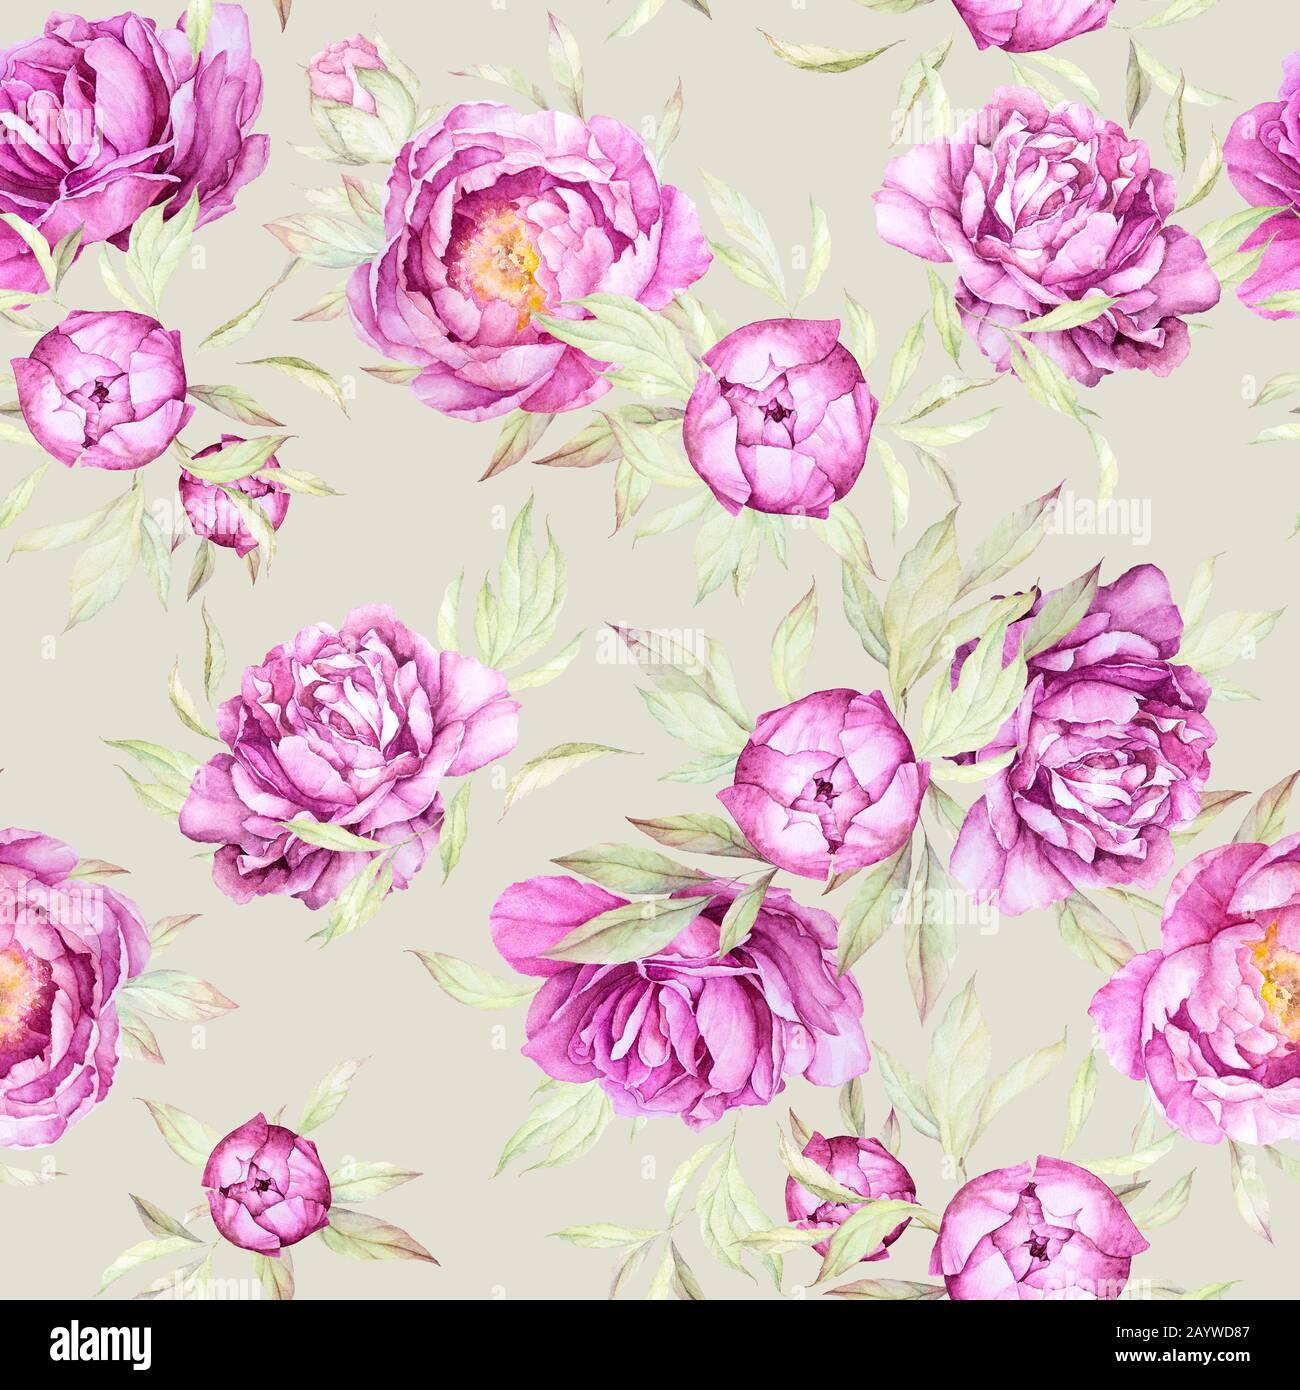 Wallpaper Designer Pastel Watercolor Floral Hydrangea Flowers Pink Blue Green